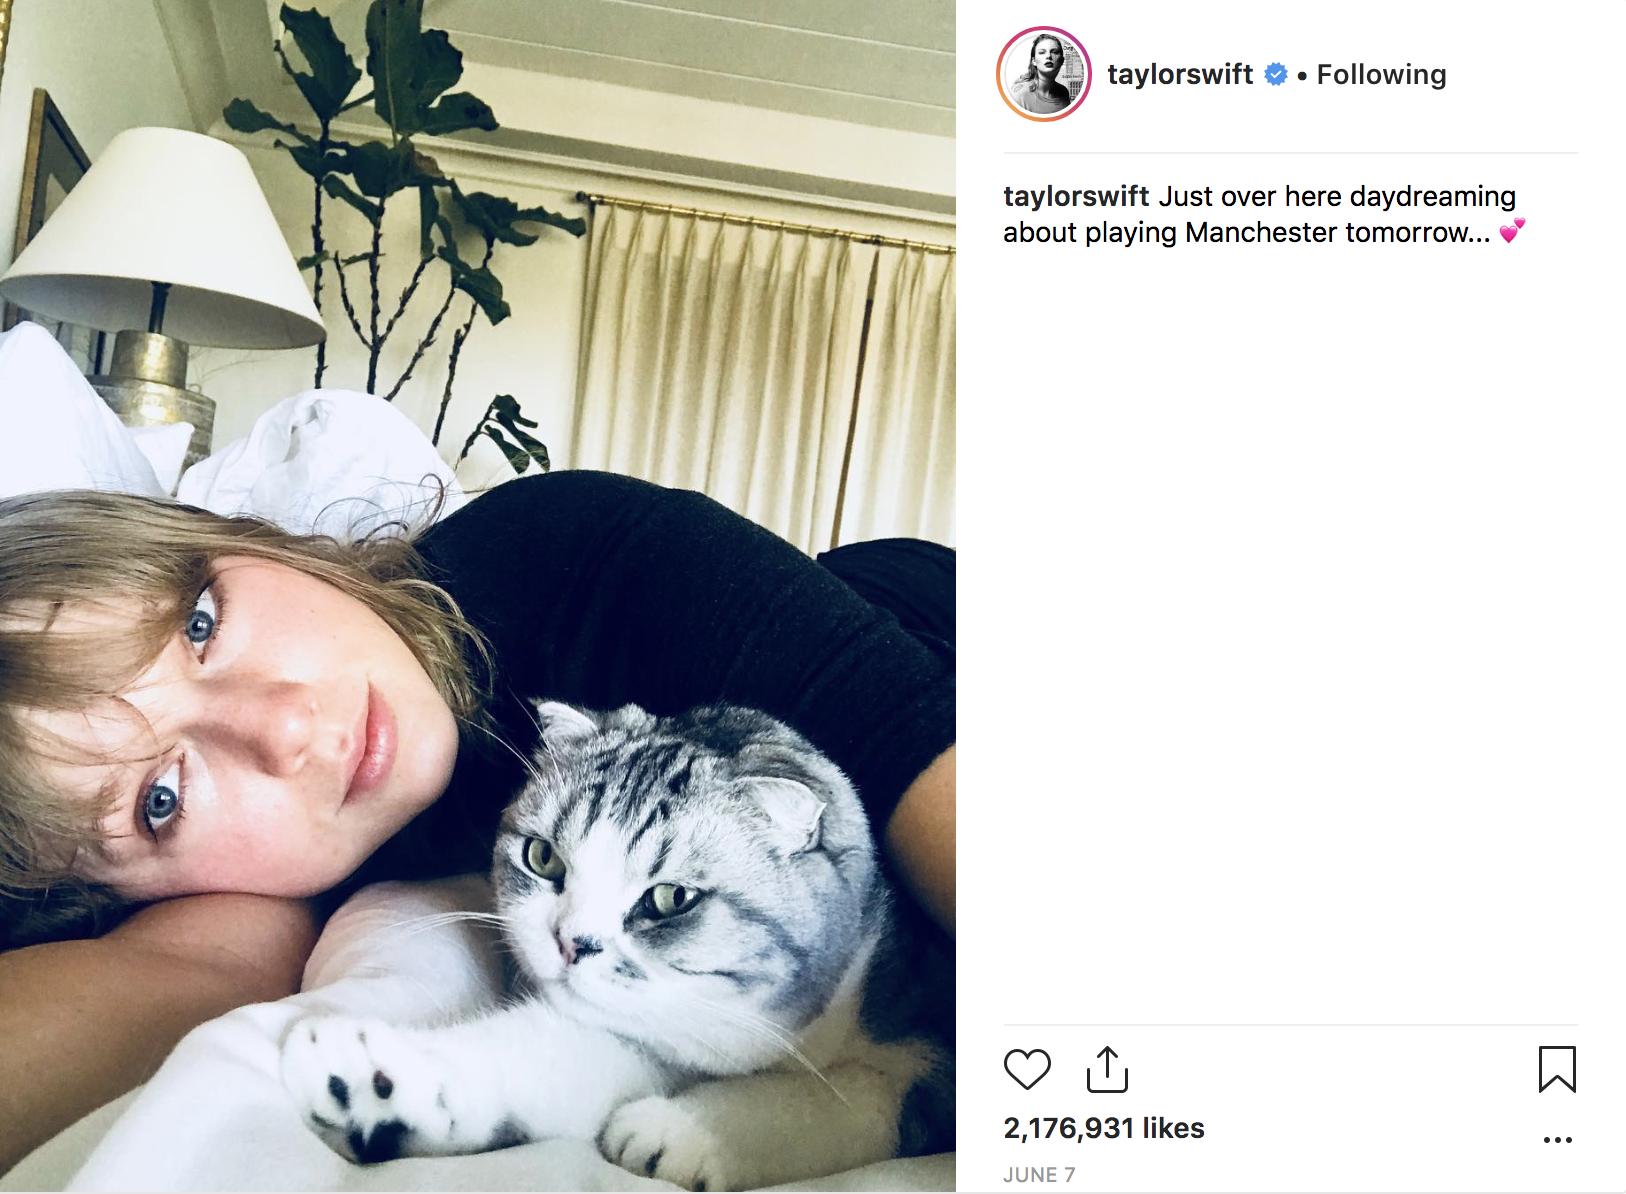 taylor-swift-instagram-influencer